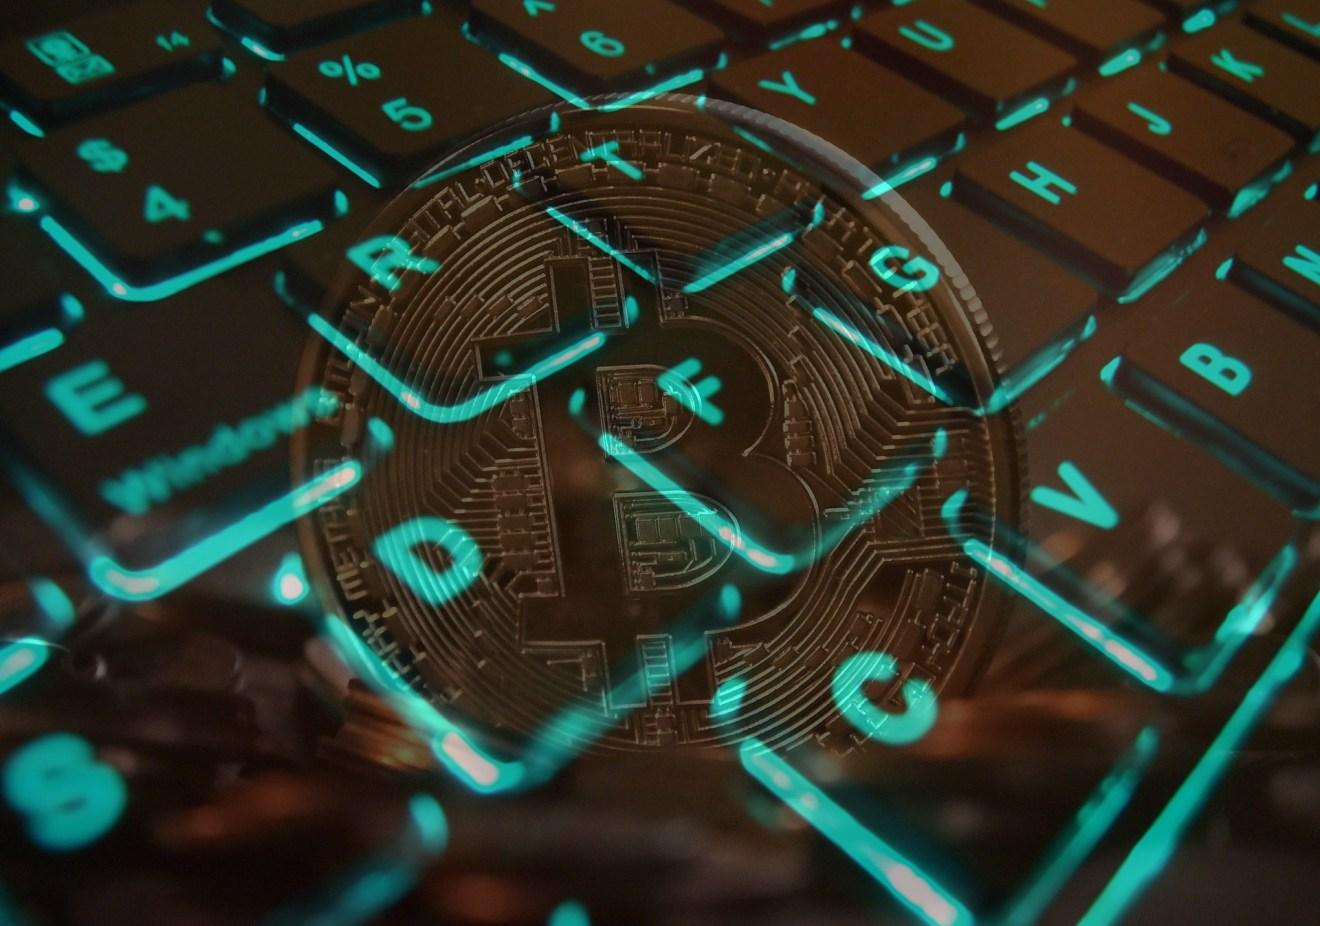 Alt-Coin Cyber-Threat